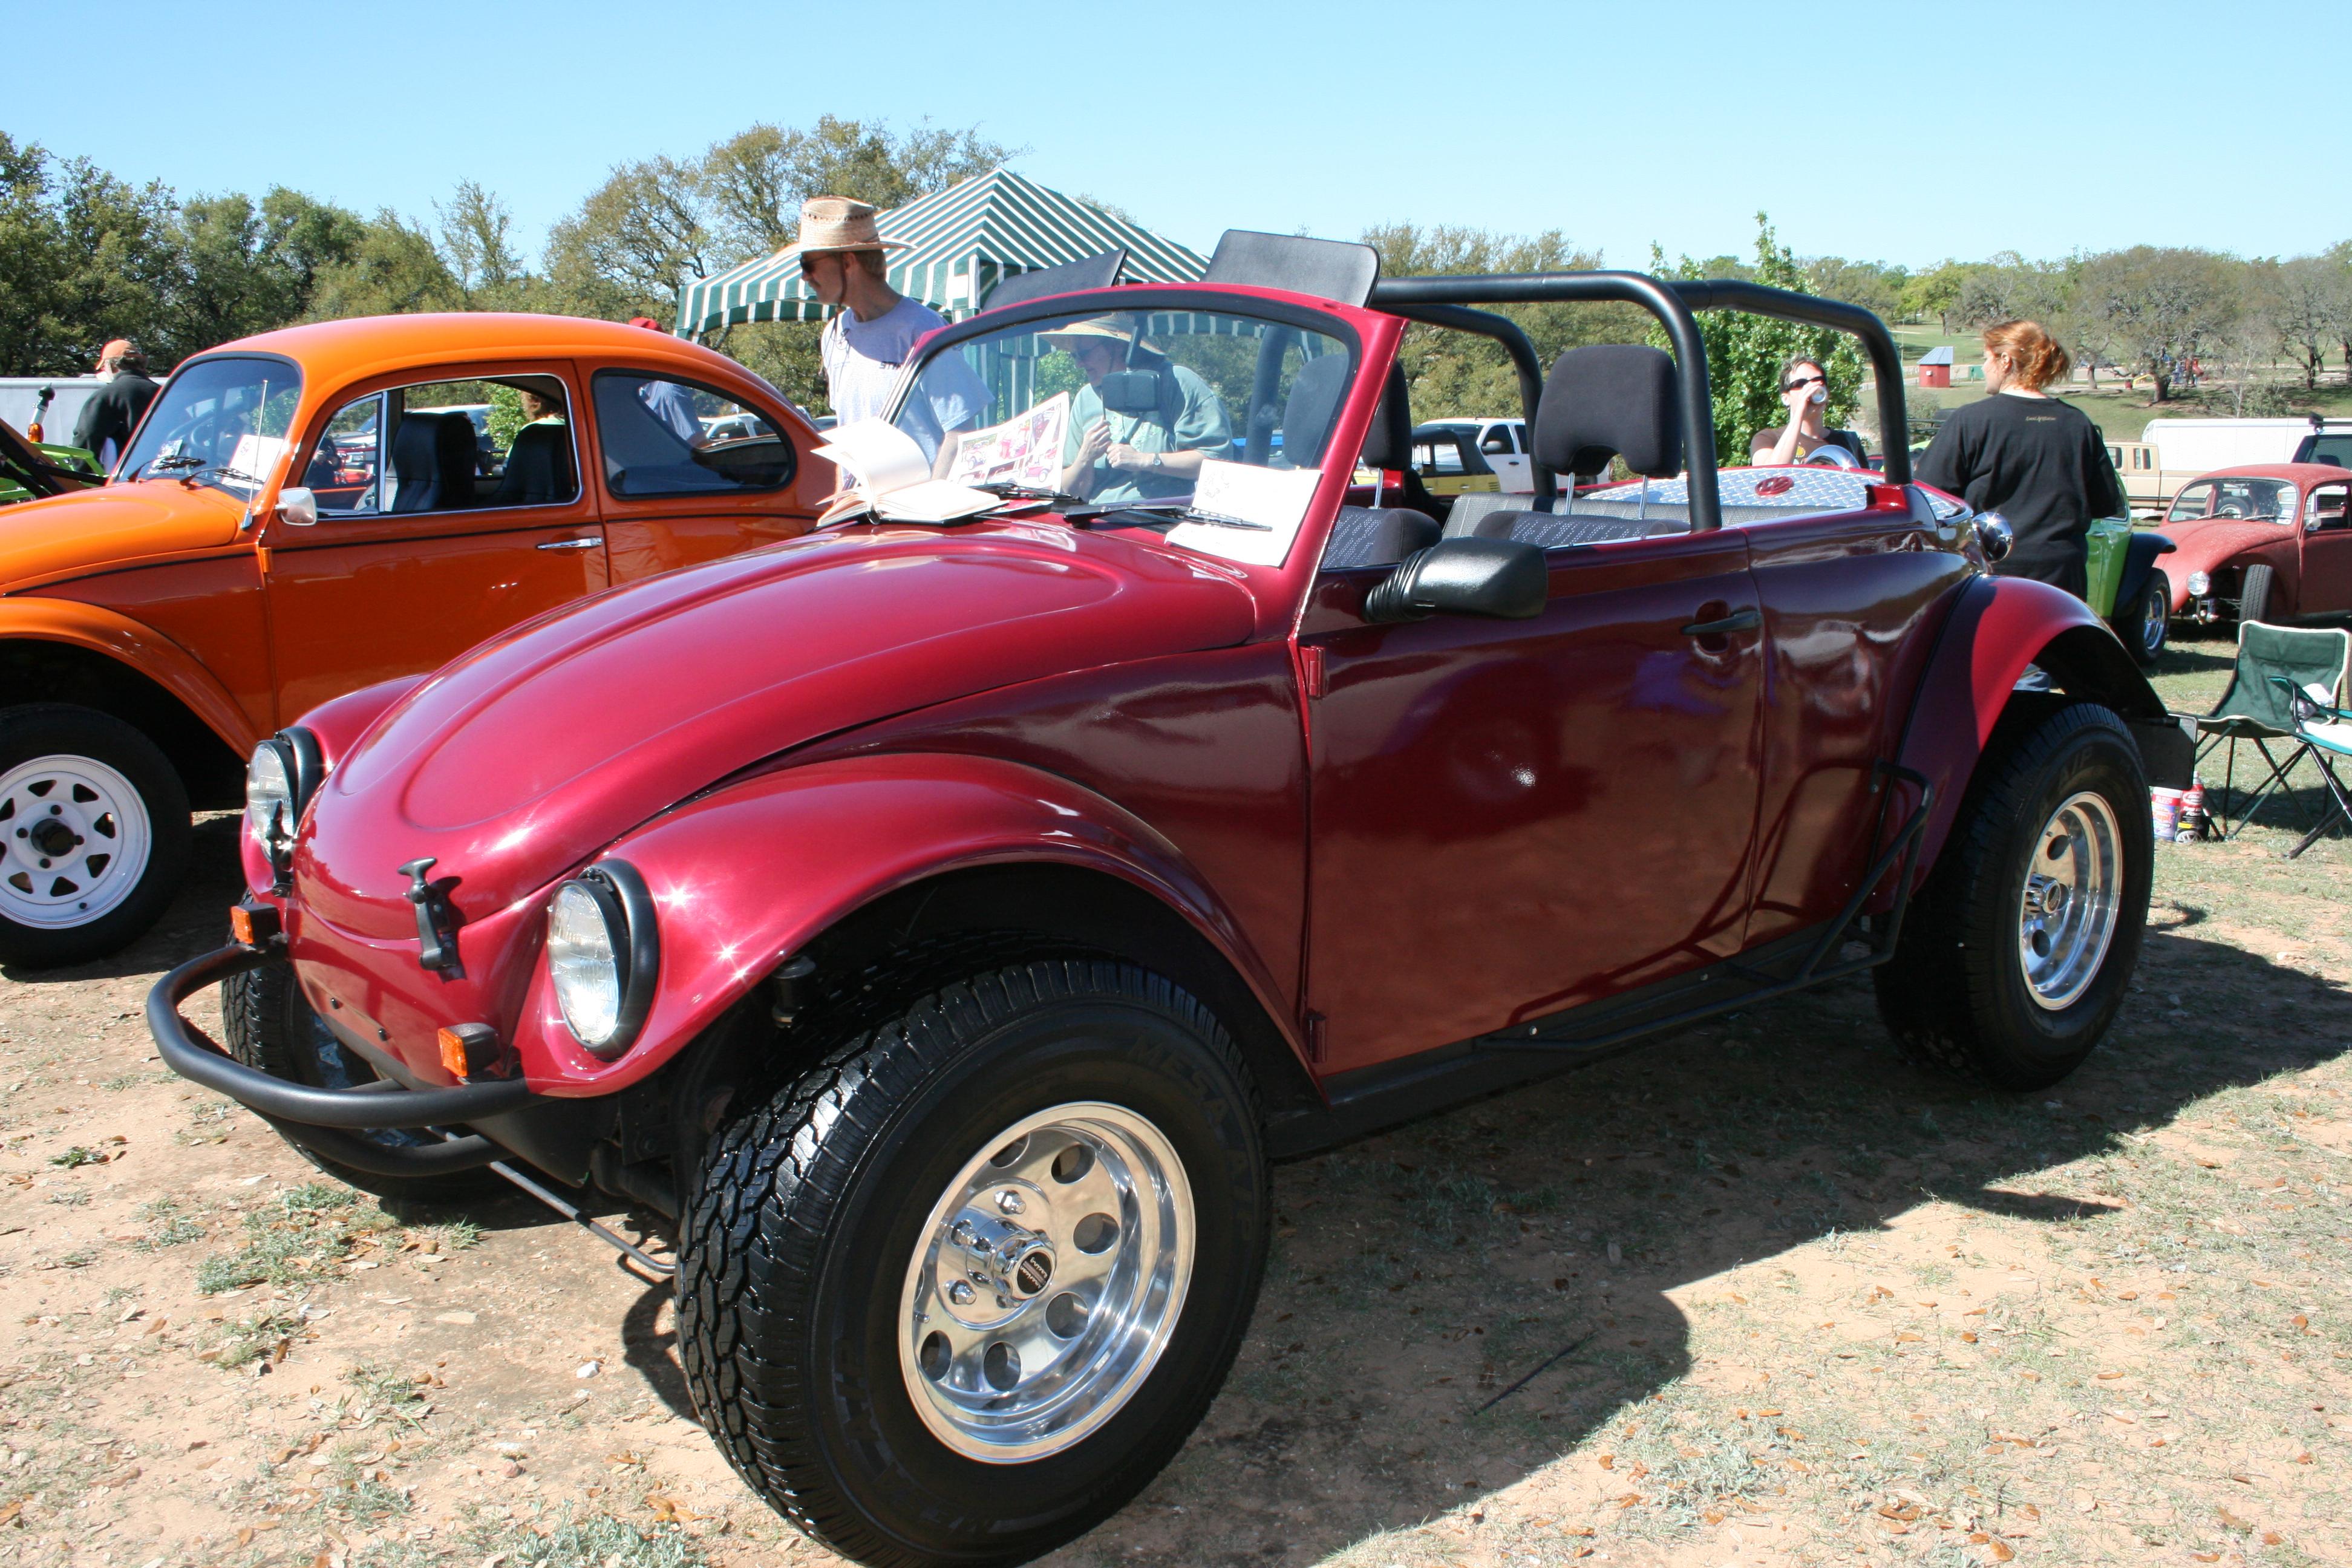 Volkswagen Abilene Tx >> #2108 - Texas VW Classic